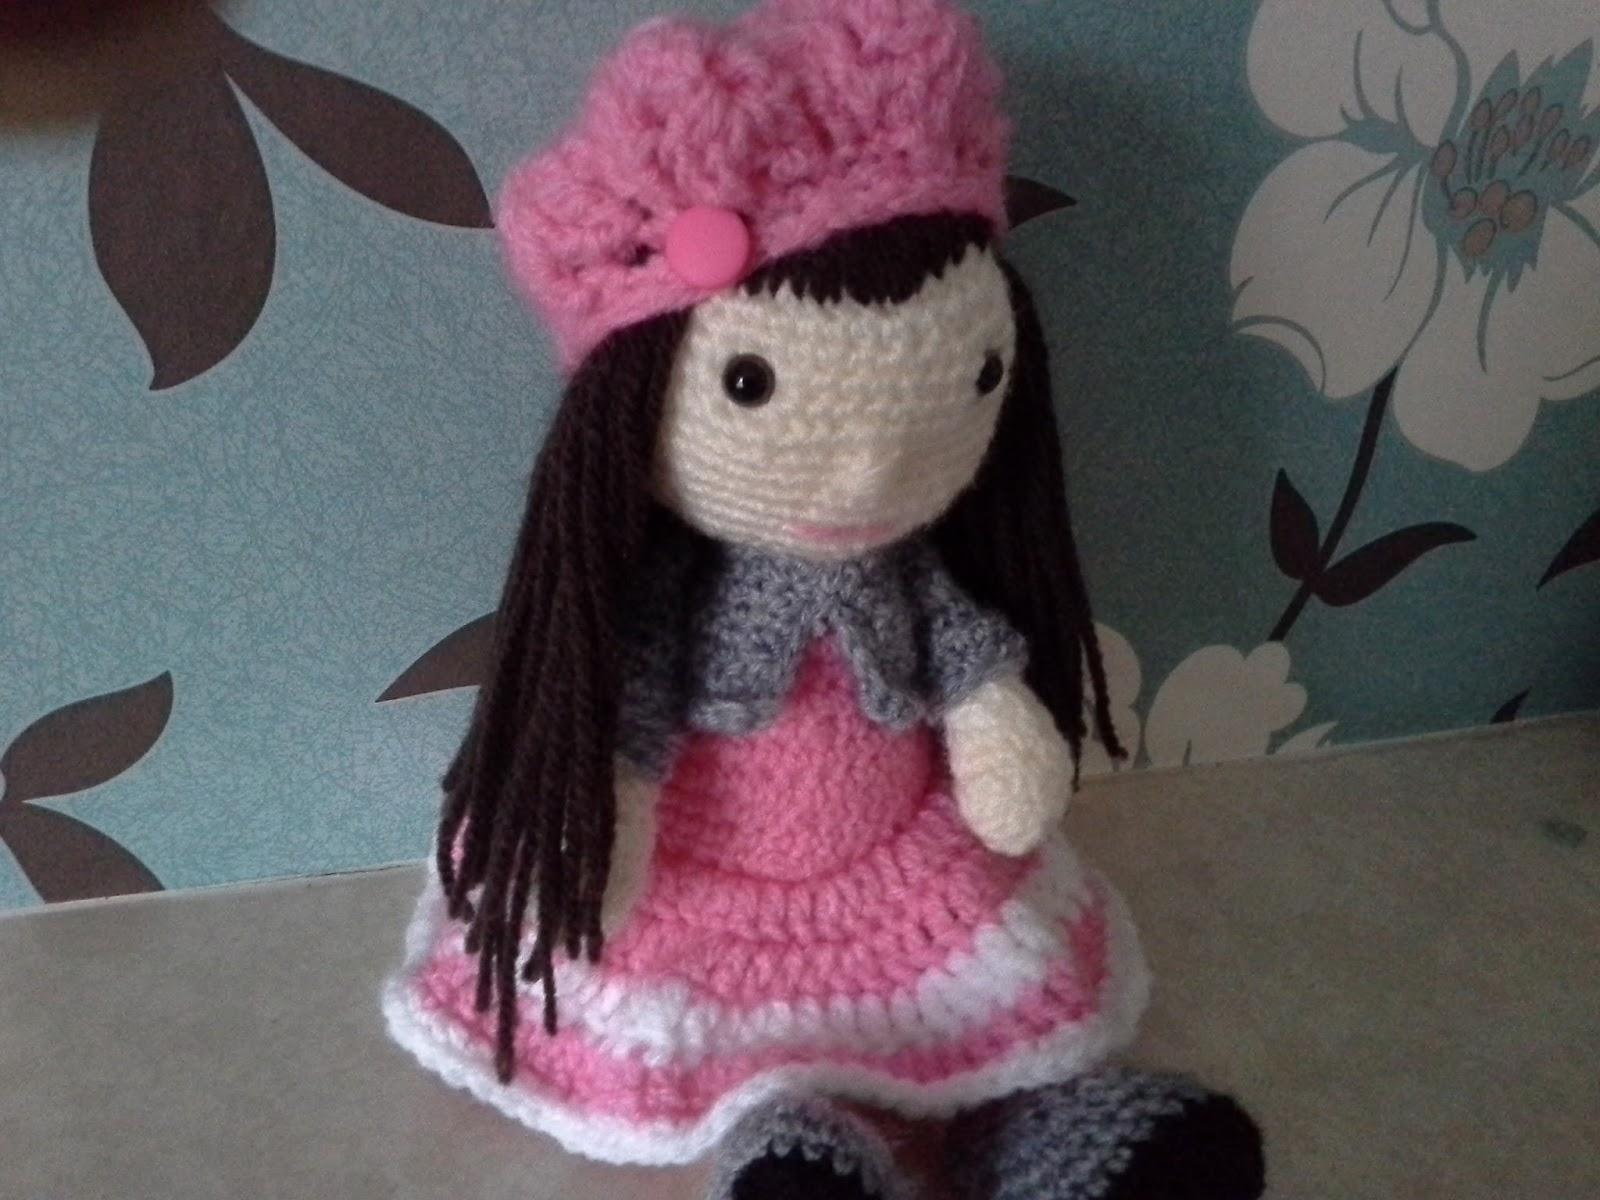 Amigurumi Doll Nose : wendy`s crafting times: Crochet amigurumi girl doll